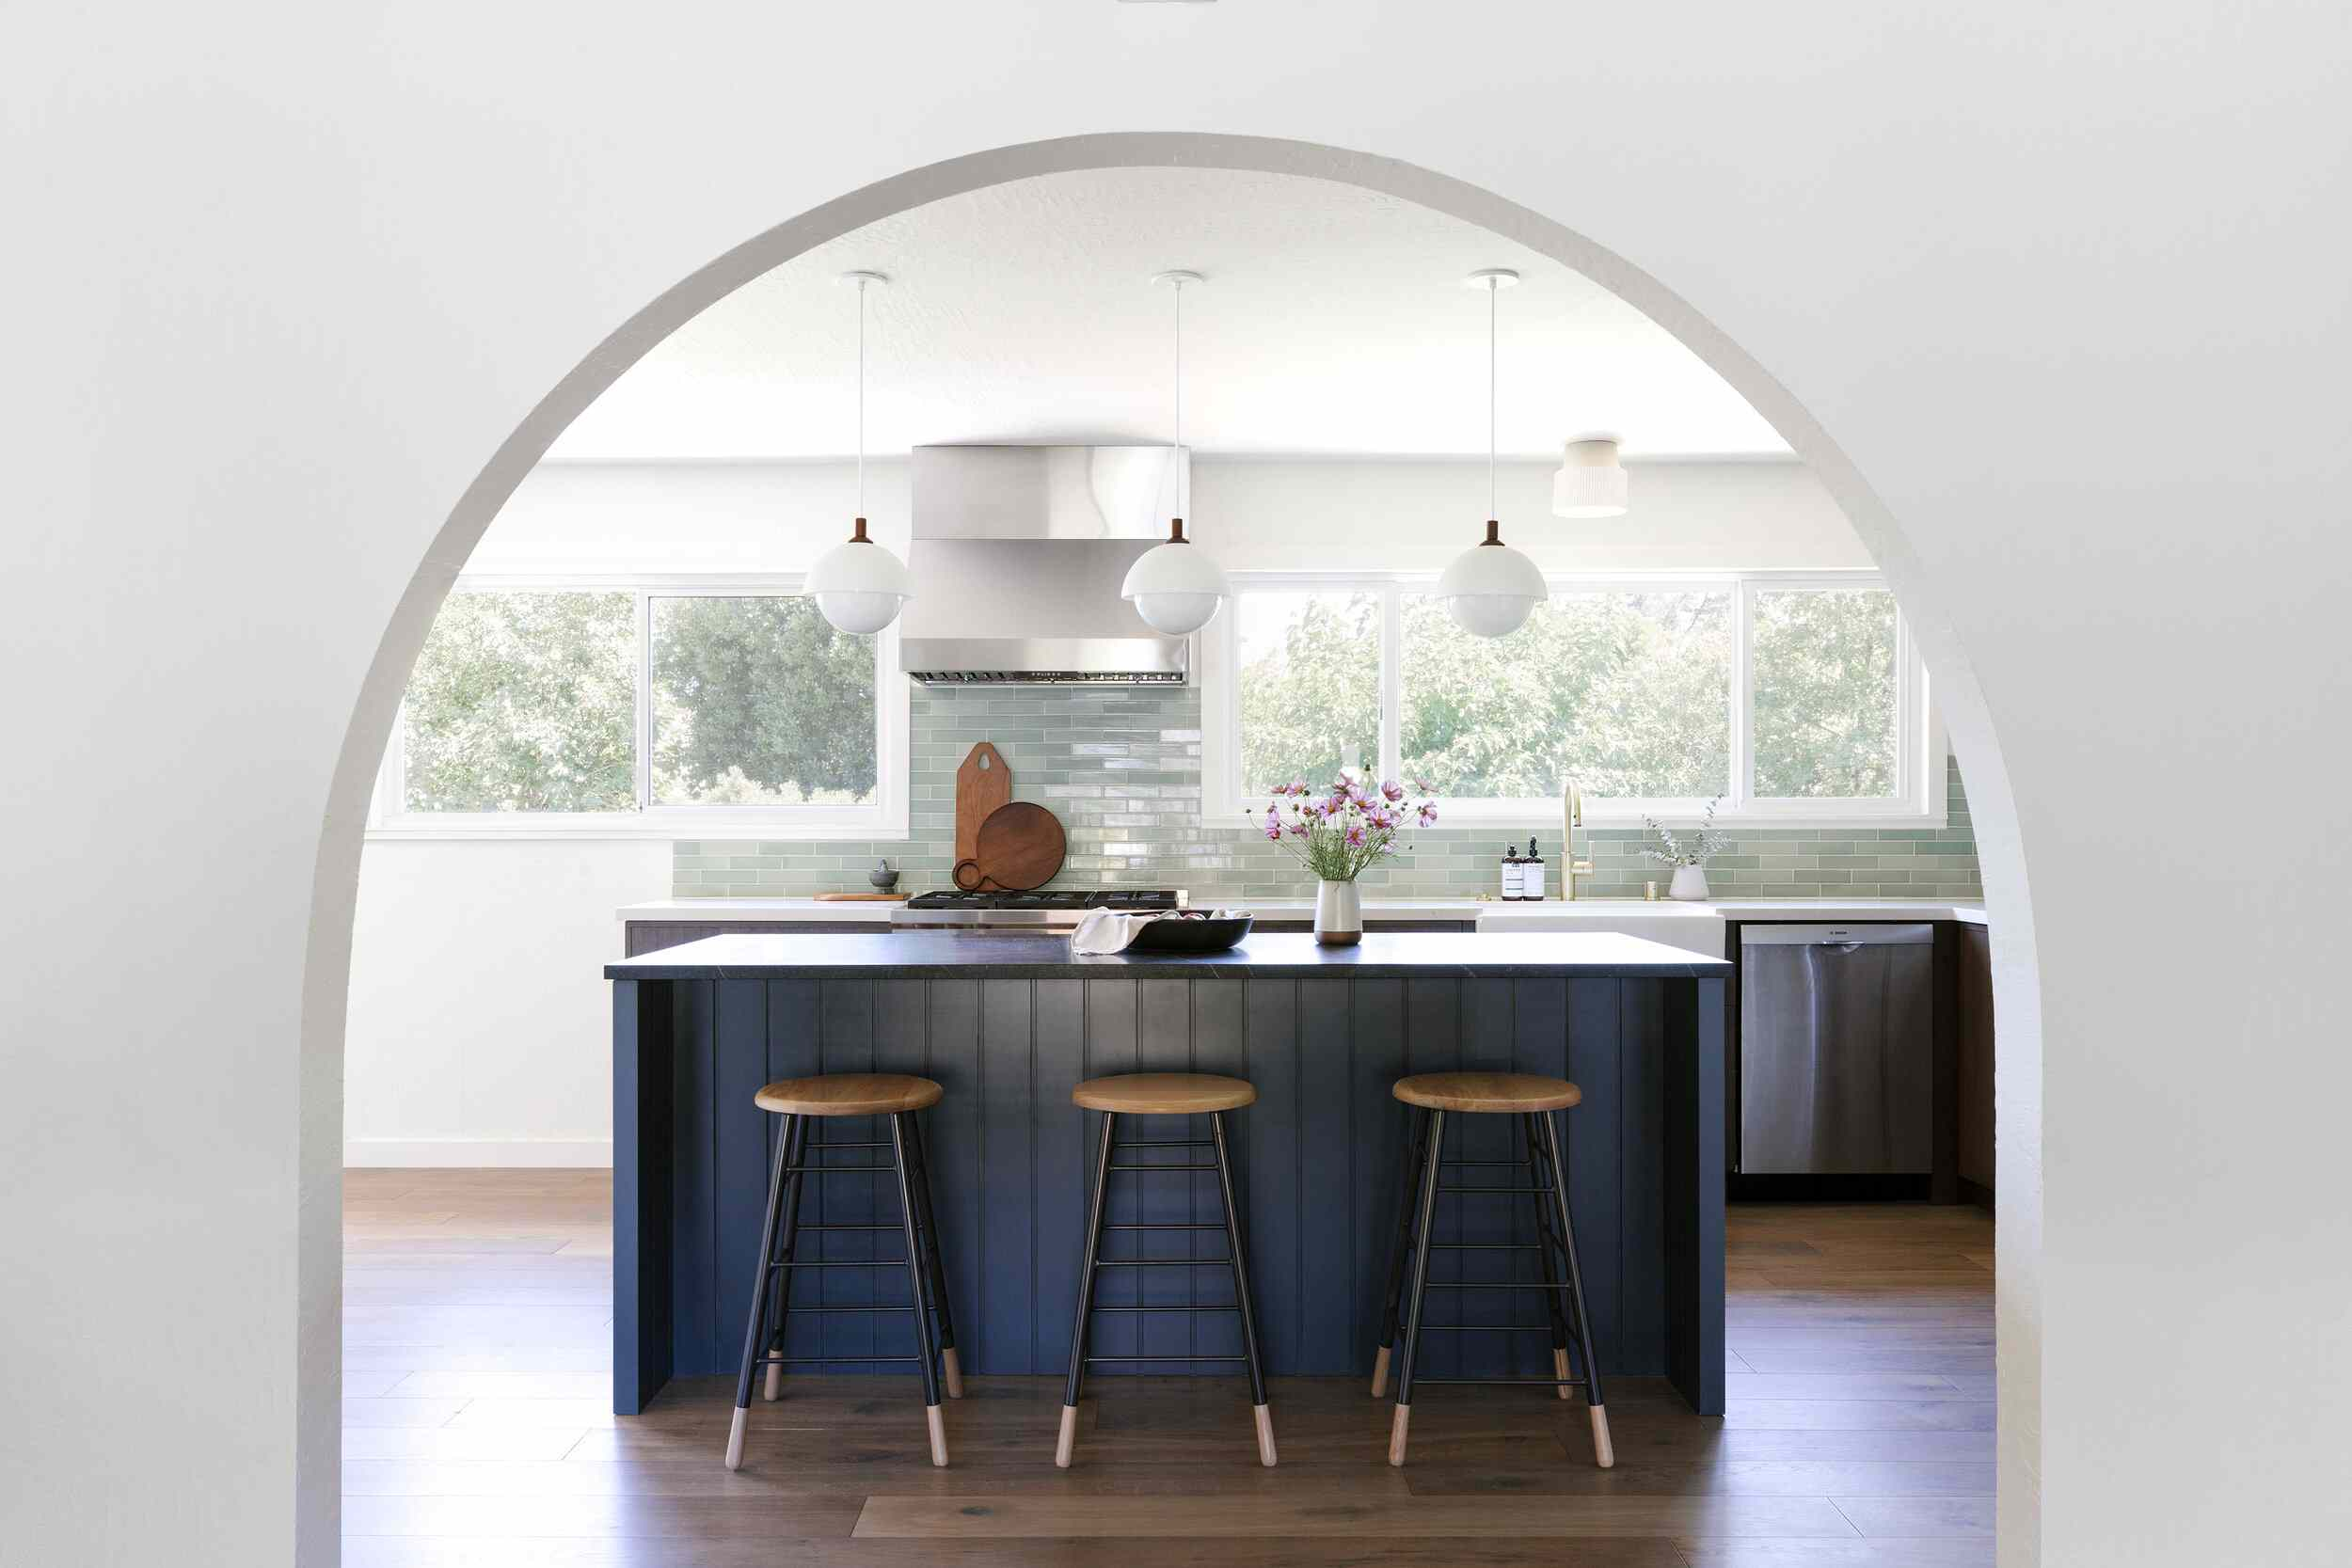 A kitchen with a dark blue island and a light blue backsplash